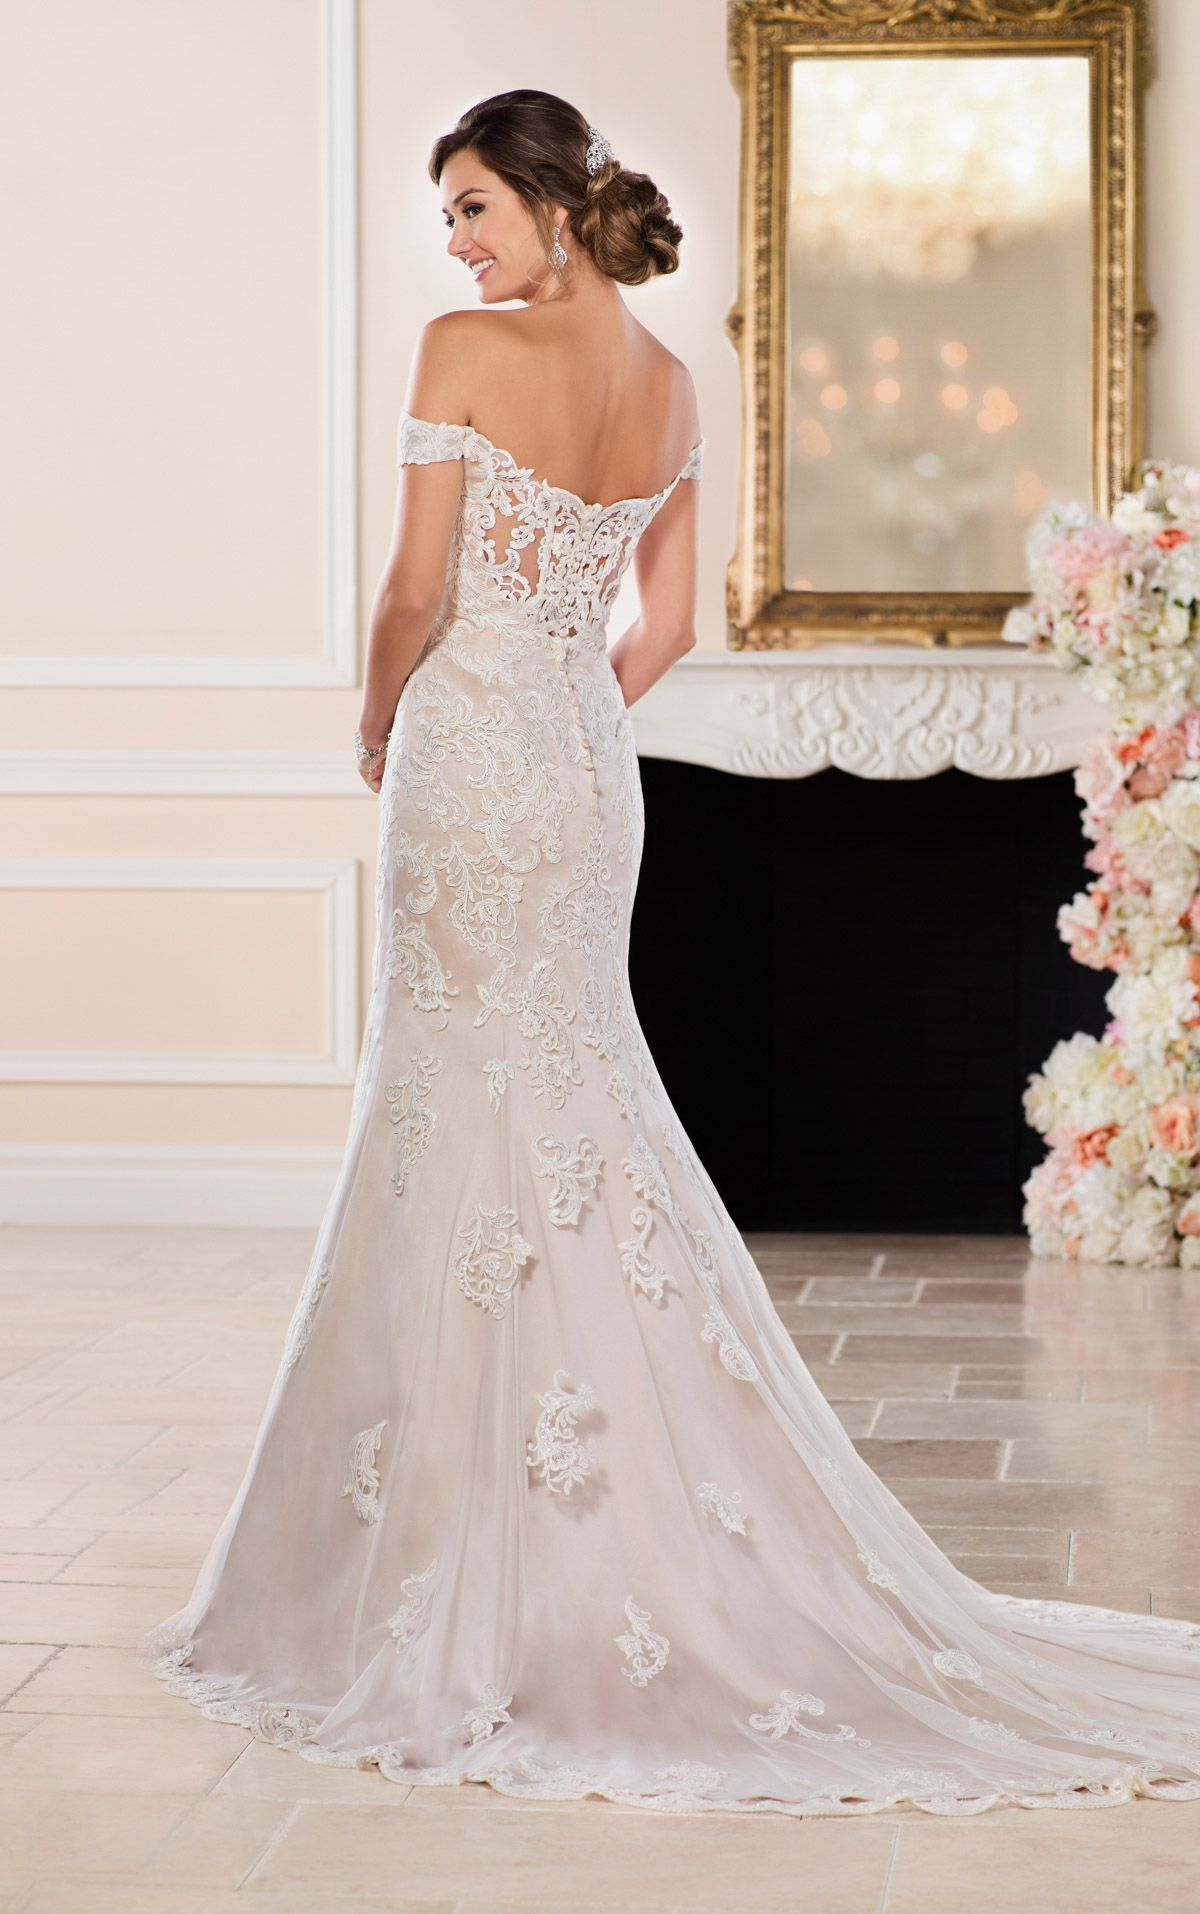 Mermaid Wedding Dresses Glamorous Mermaid Wedding Gown Stella York Perfect Wedding Dress Wedding Dresses Wedding Dress Sewing Patterns [ 1914 x 1200 Pixel ]